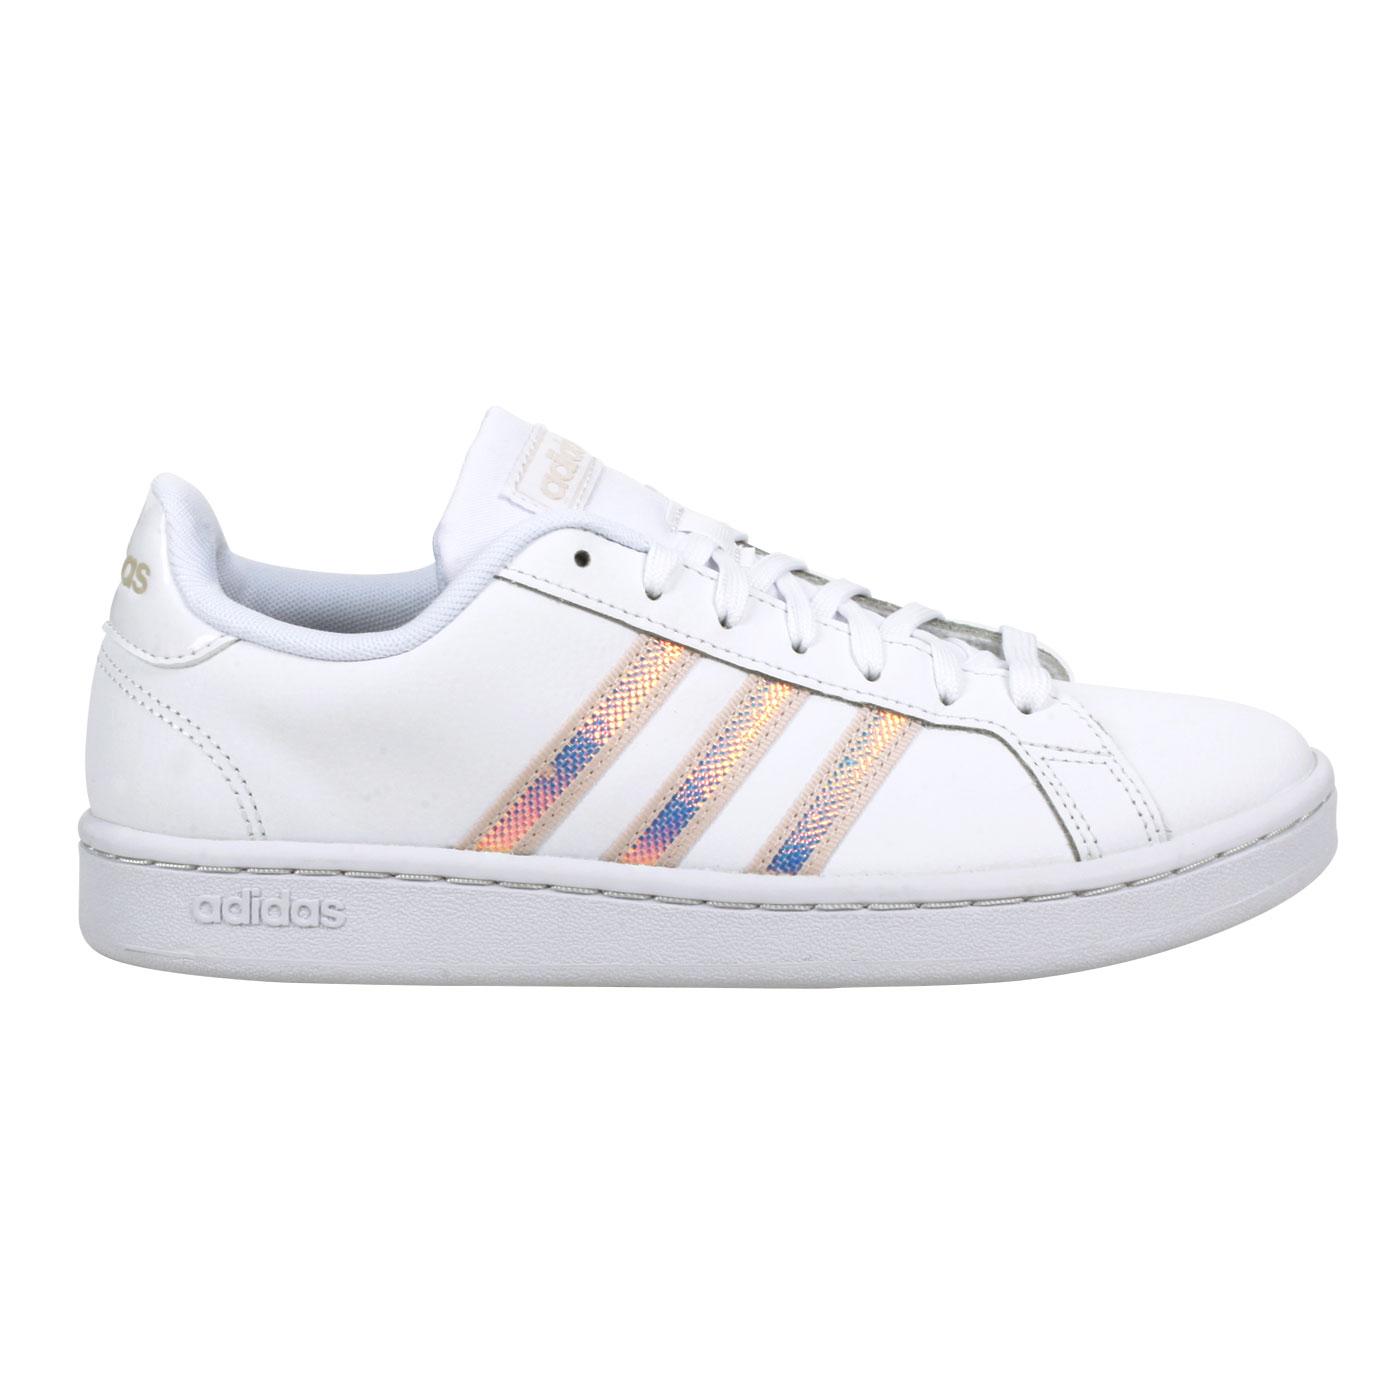 ADIDAS 女款休閒運動鞋 FW3734 - 白淺棕銀